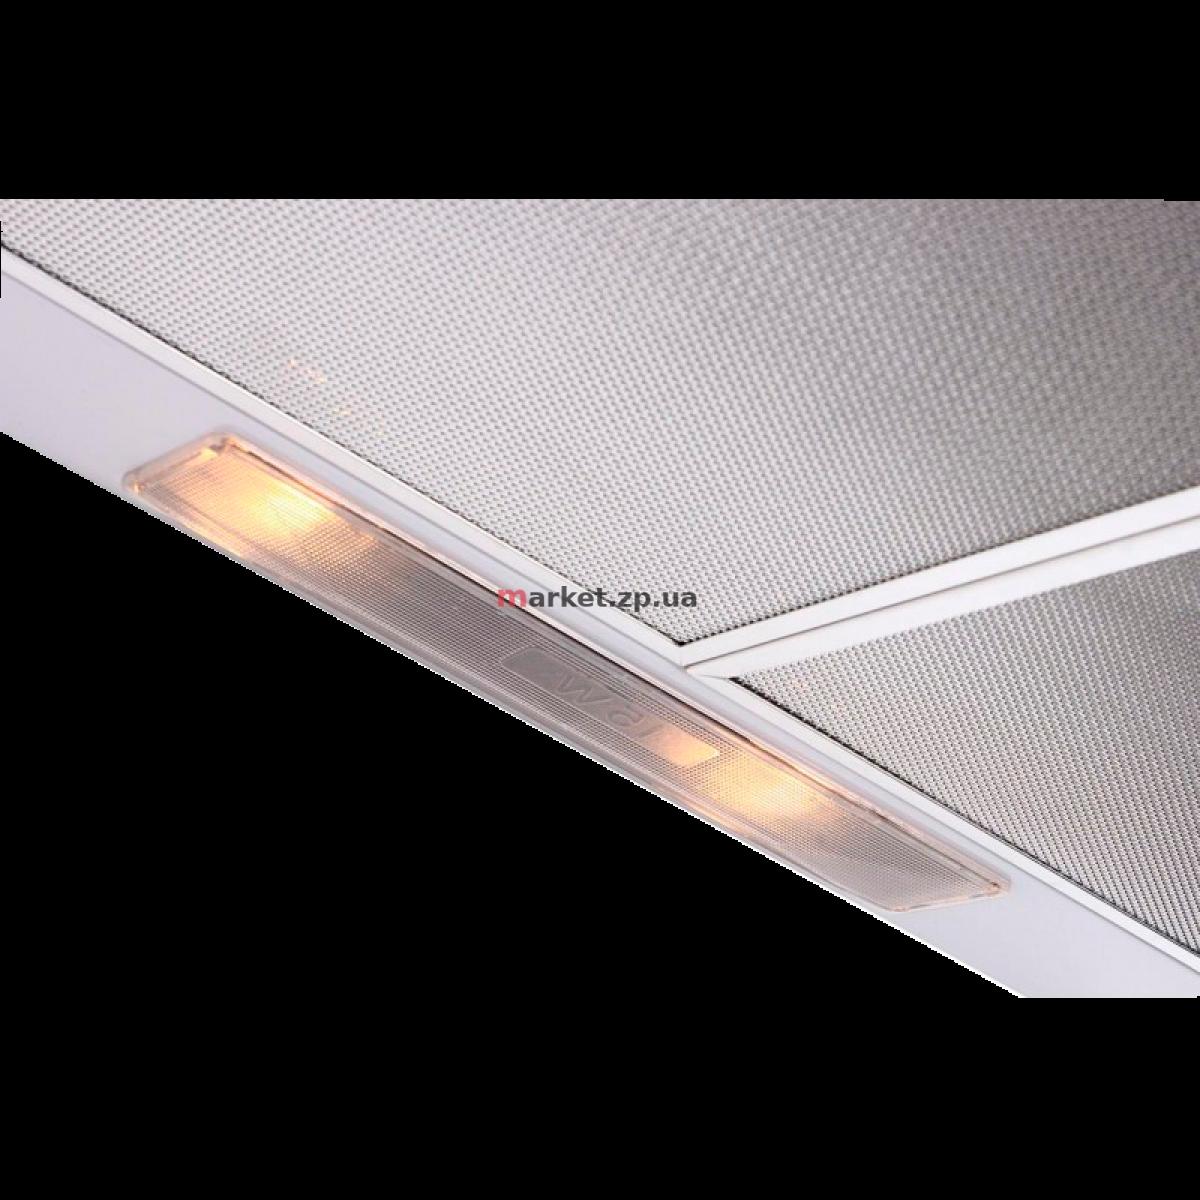 Вытяжка VENTOLUX LAZIO 50 WH (750)